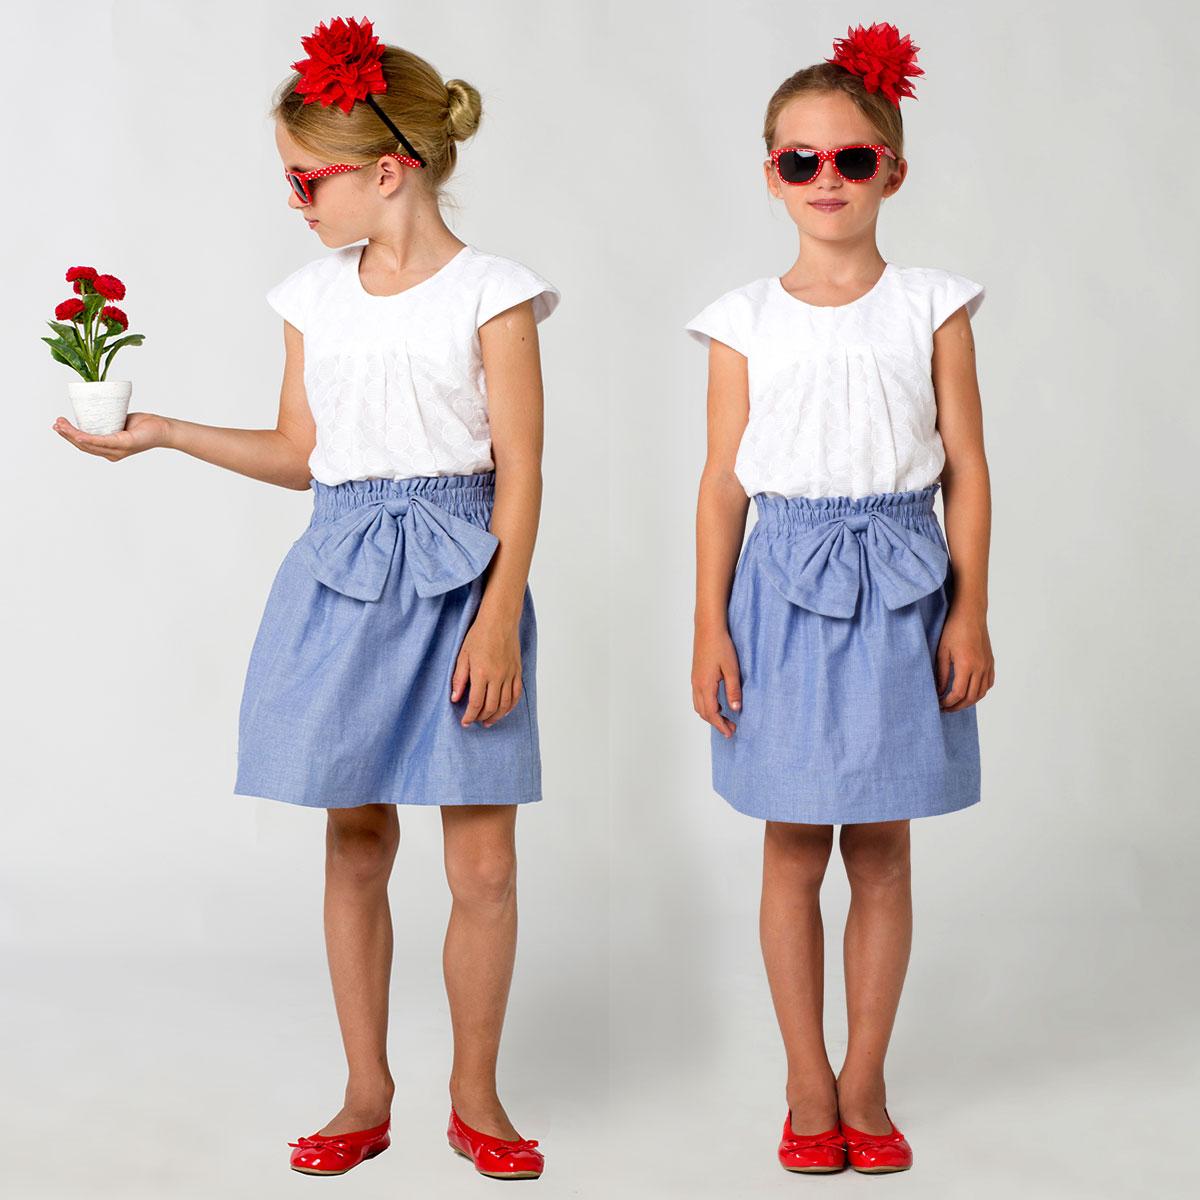 shorts-sewing-pattern-9